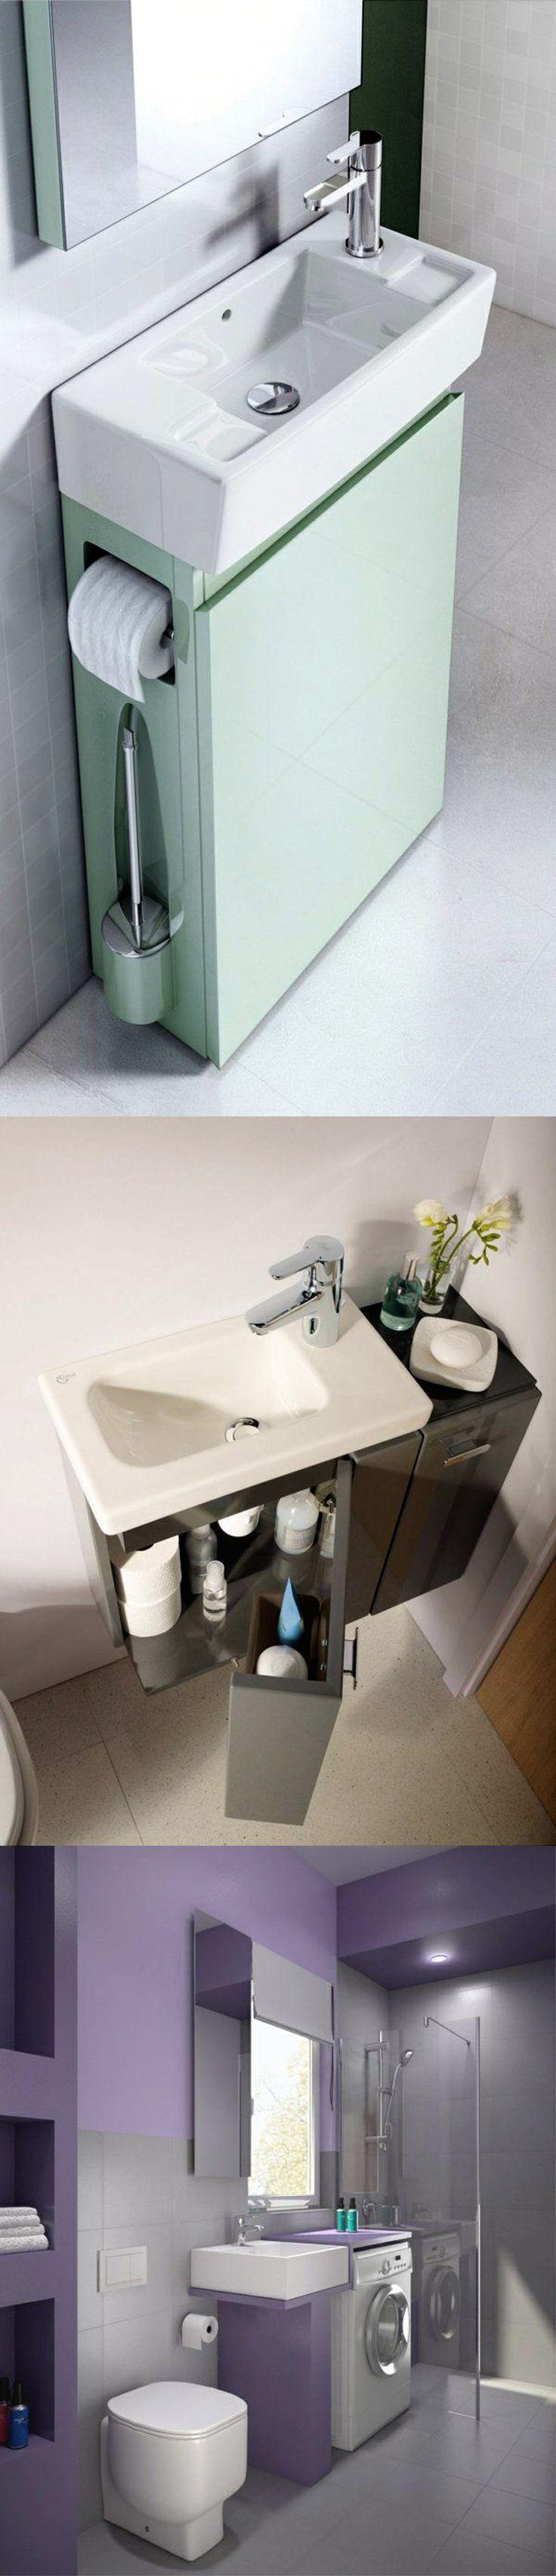 Best 25 Modern bathroom furniture ideas on Pinterest